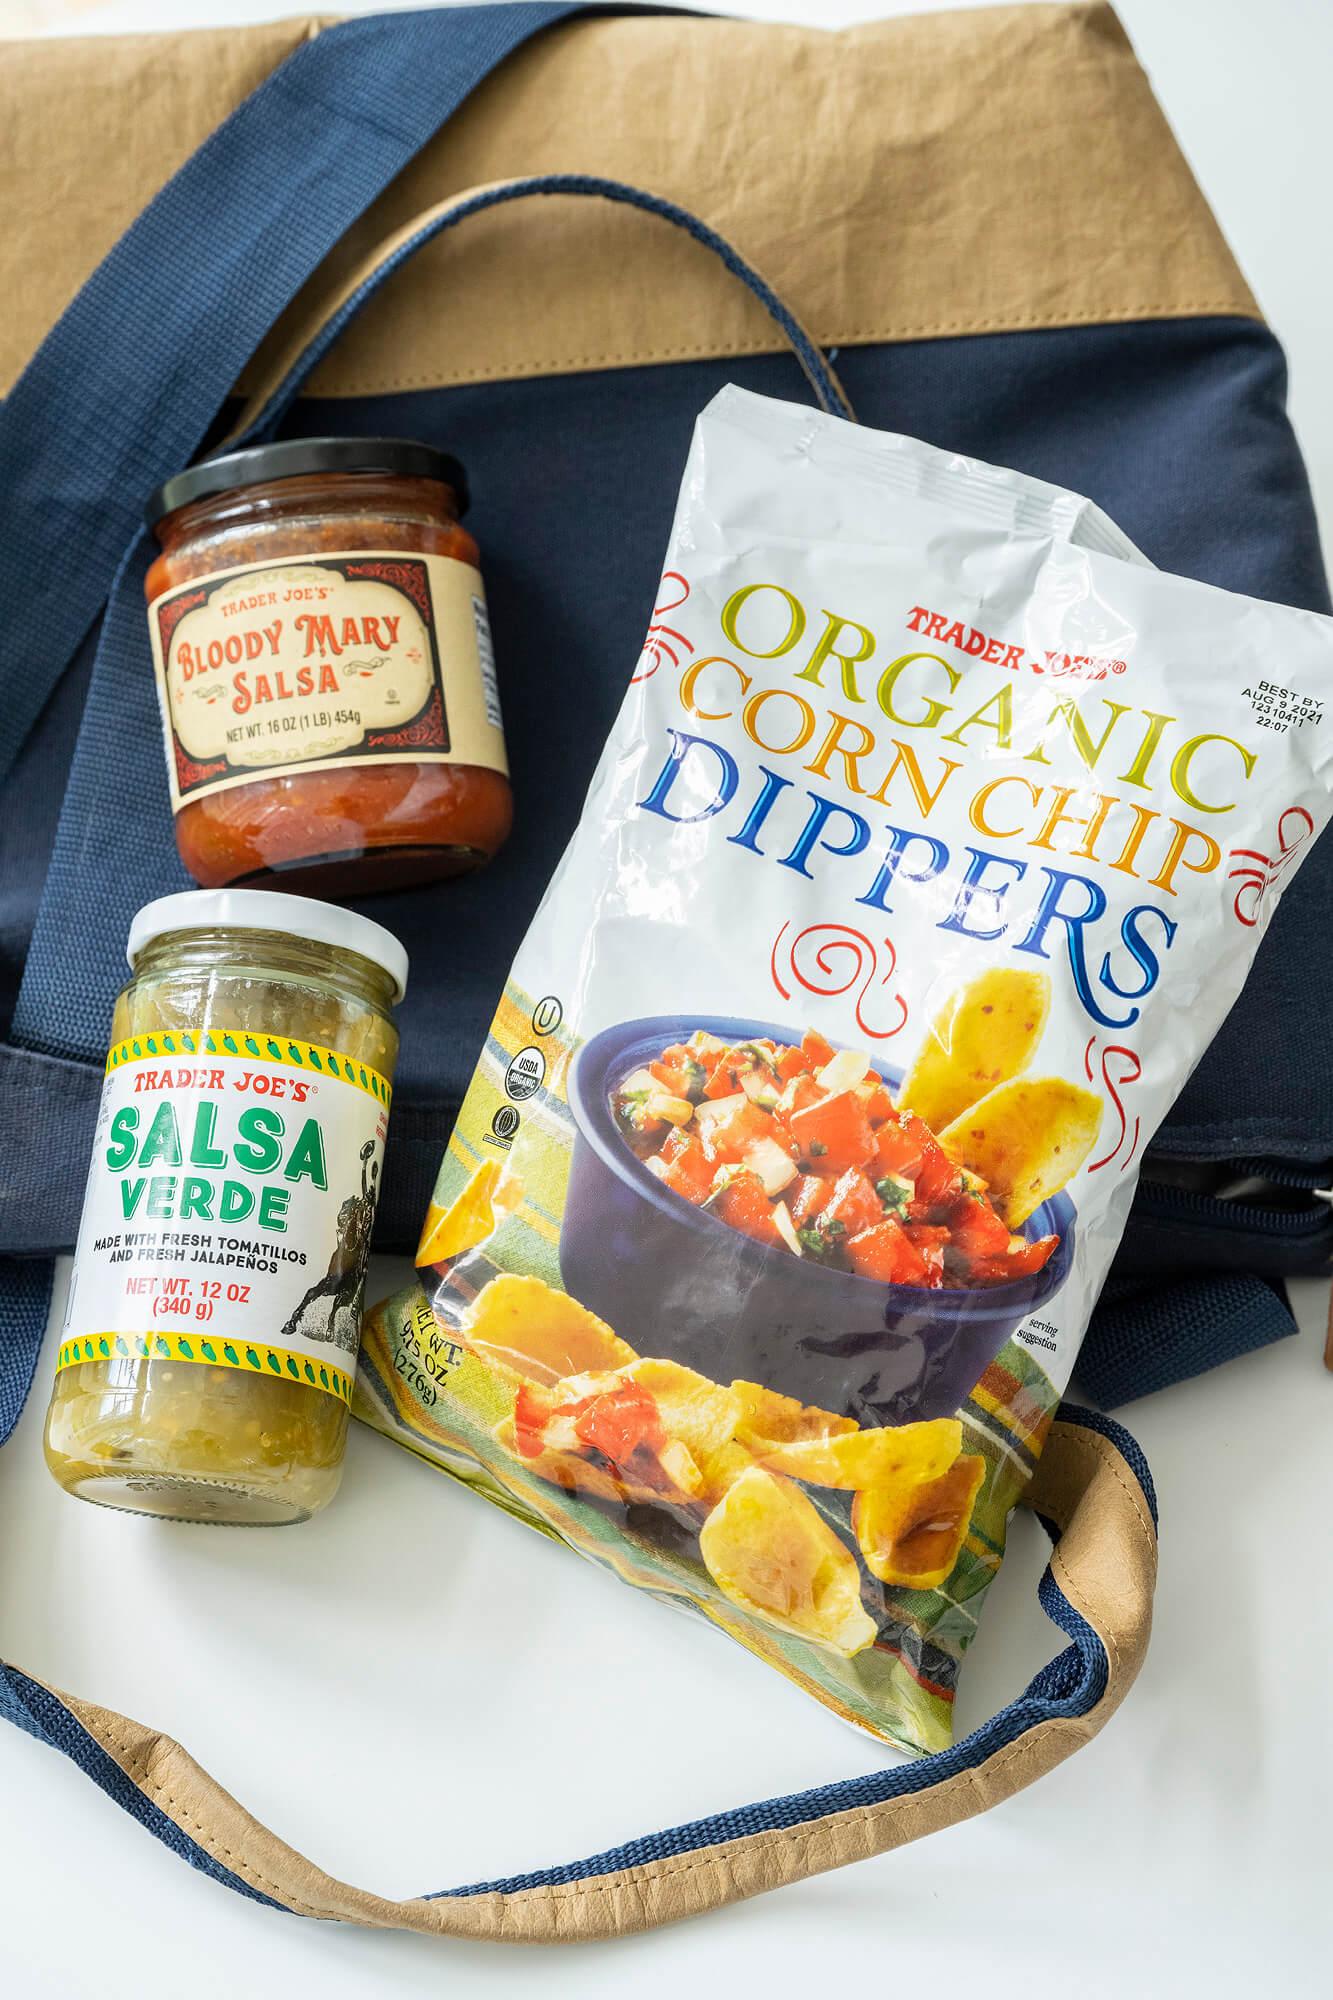 Trader Joe's Salsa and Corn Chip Dippers